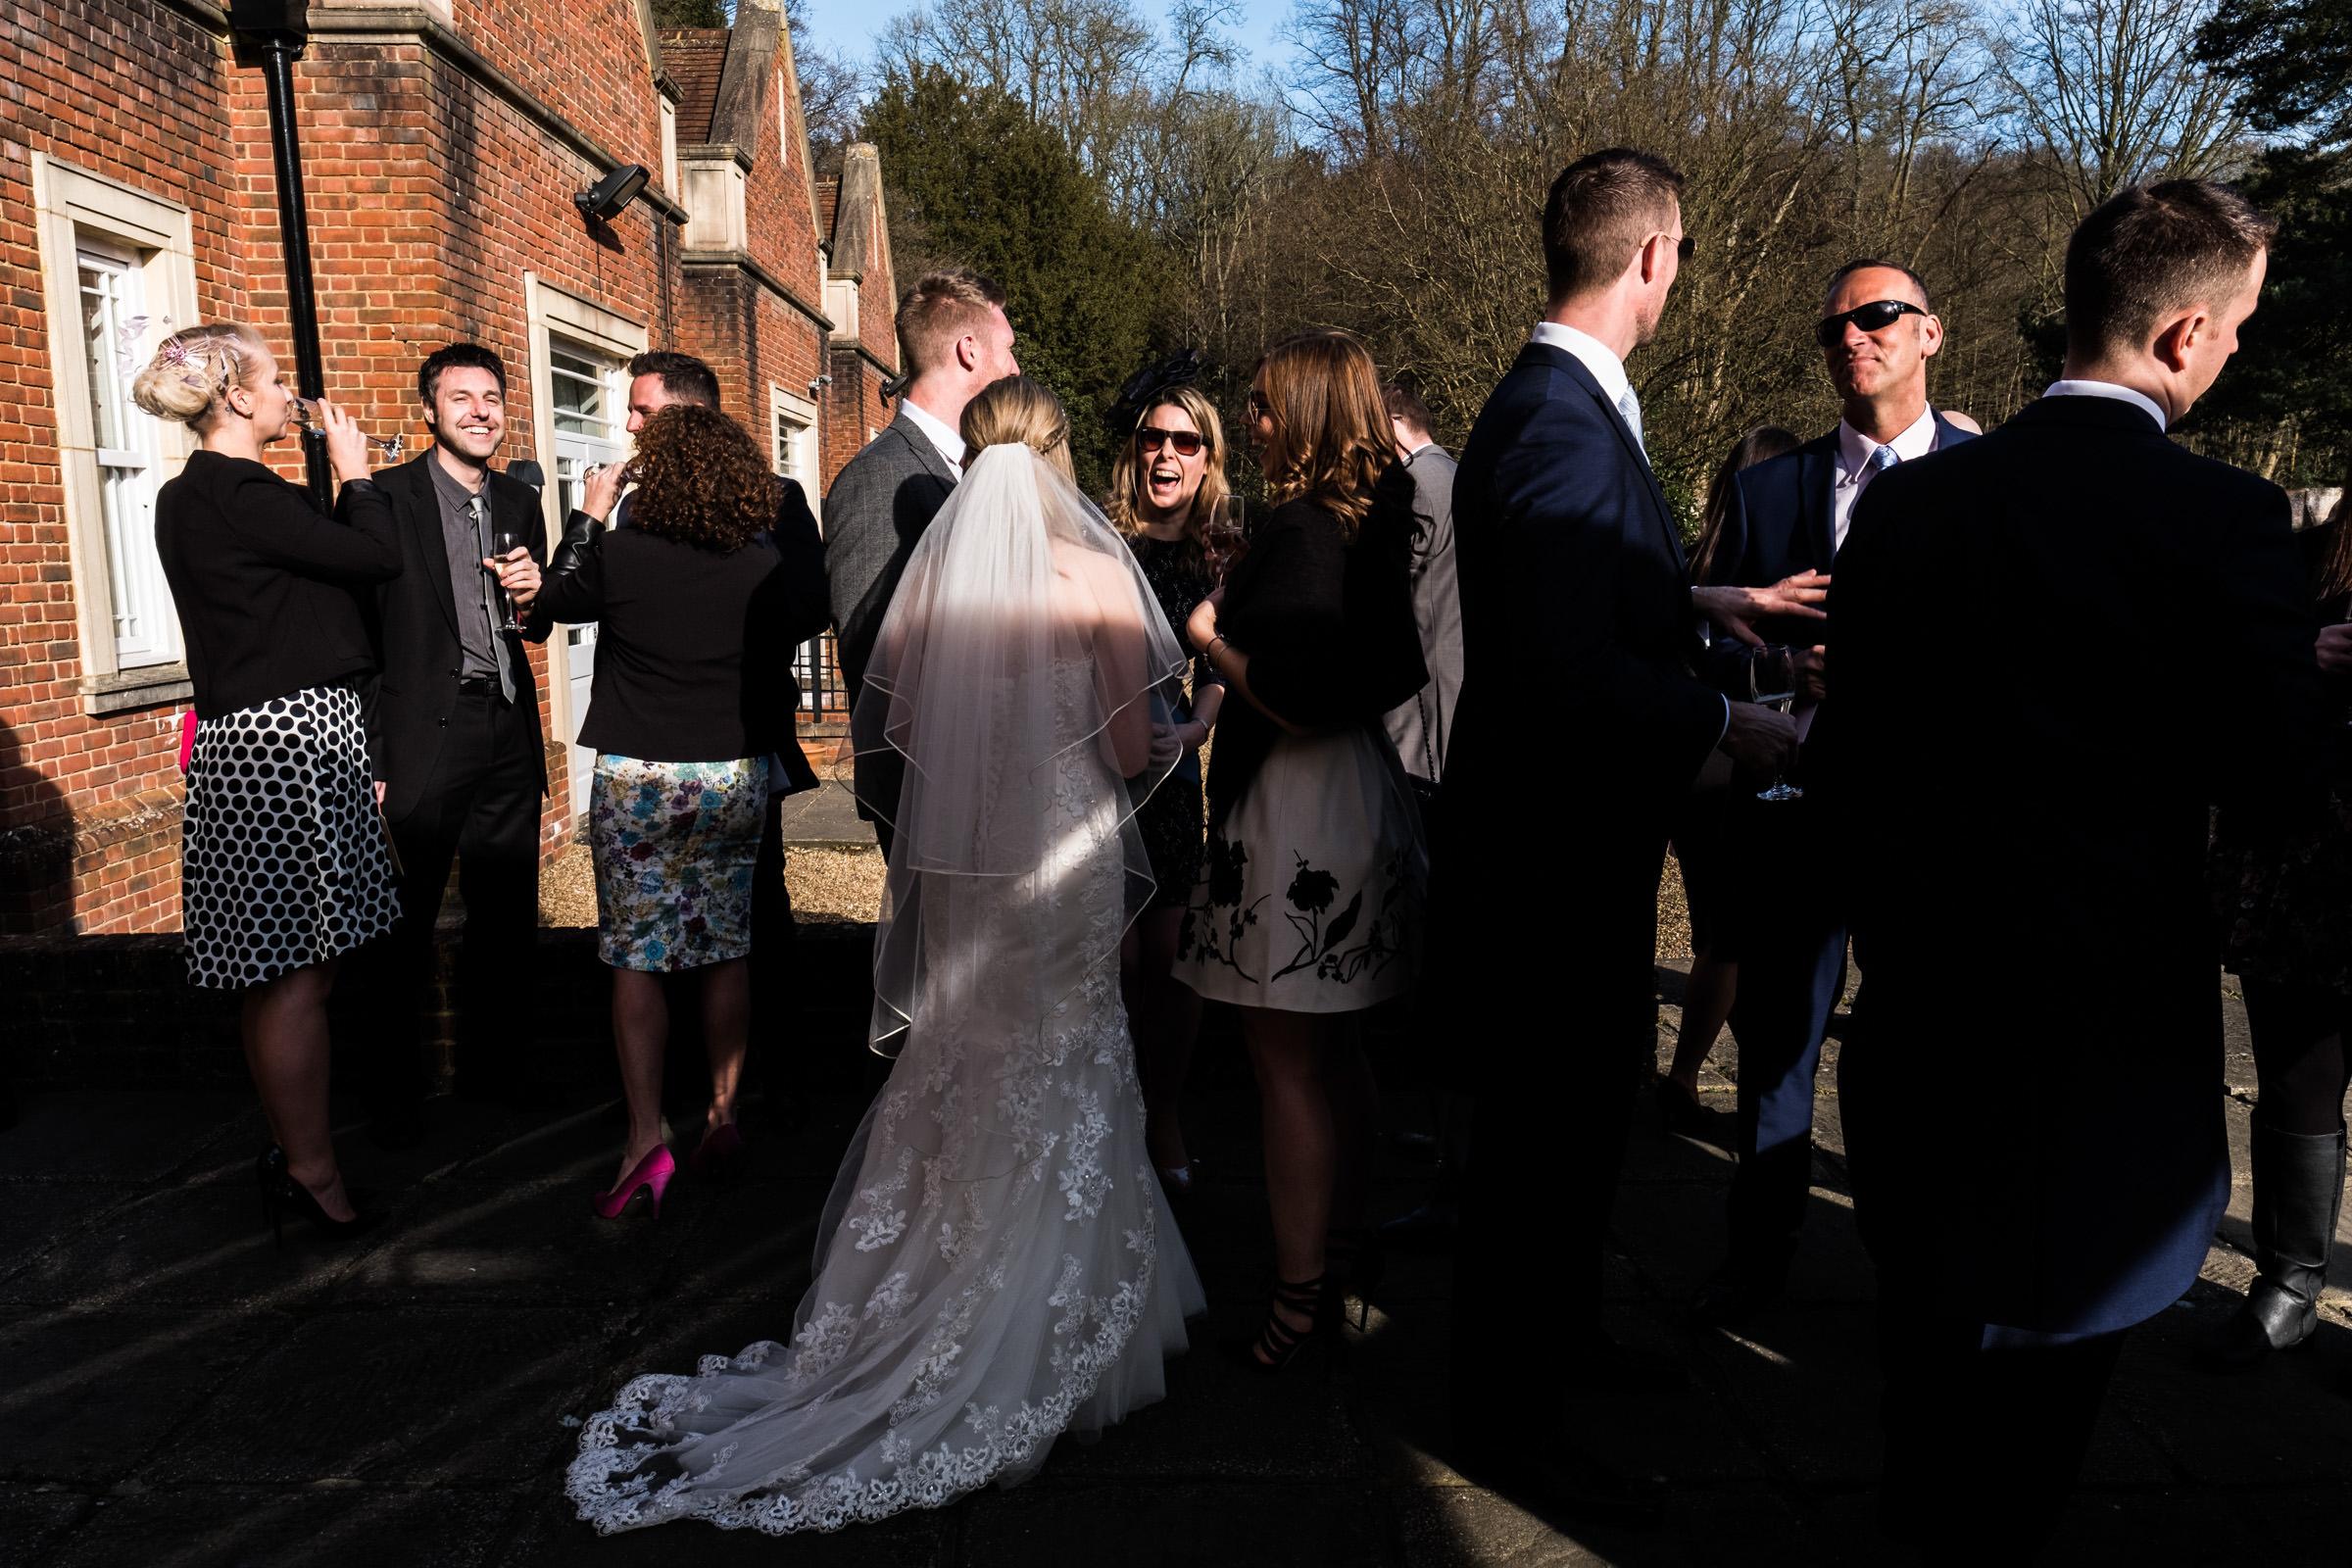 Donna & Nick's Wedding at Wotton House in Dorking 016.jpg